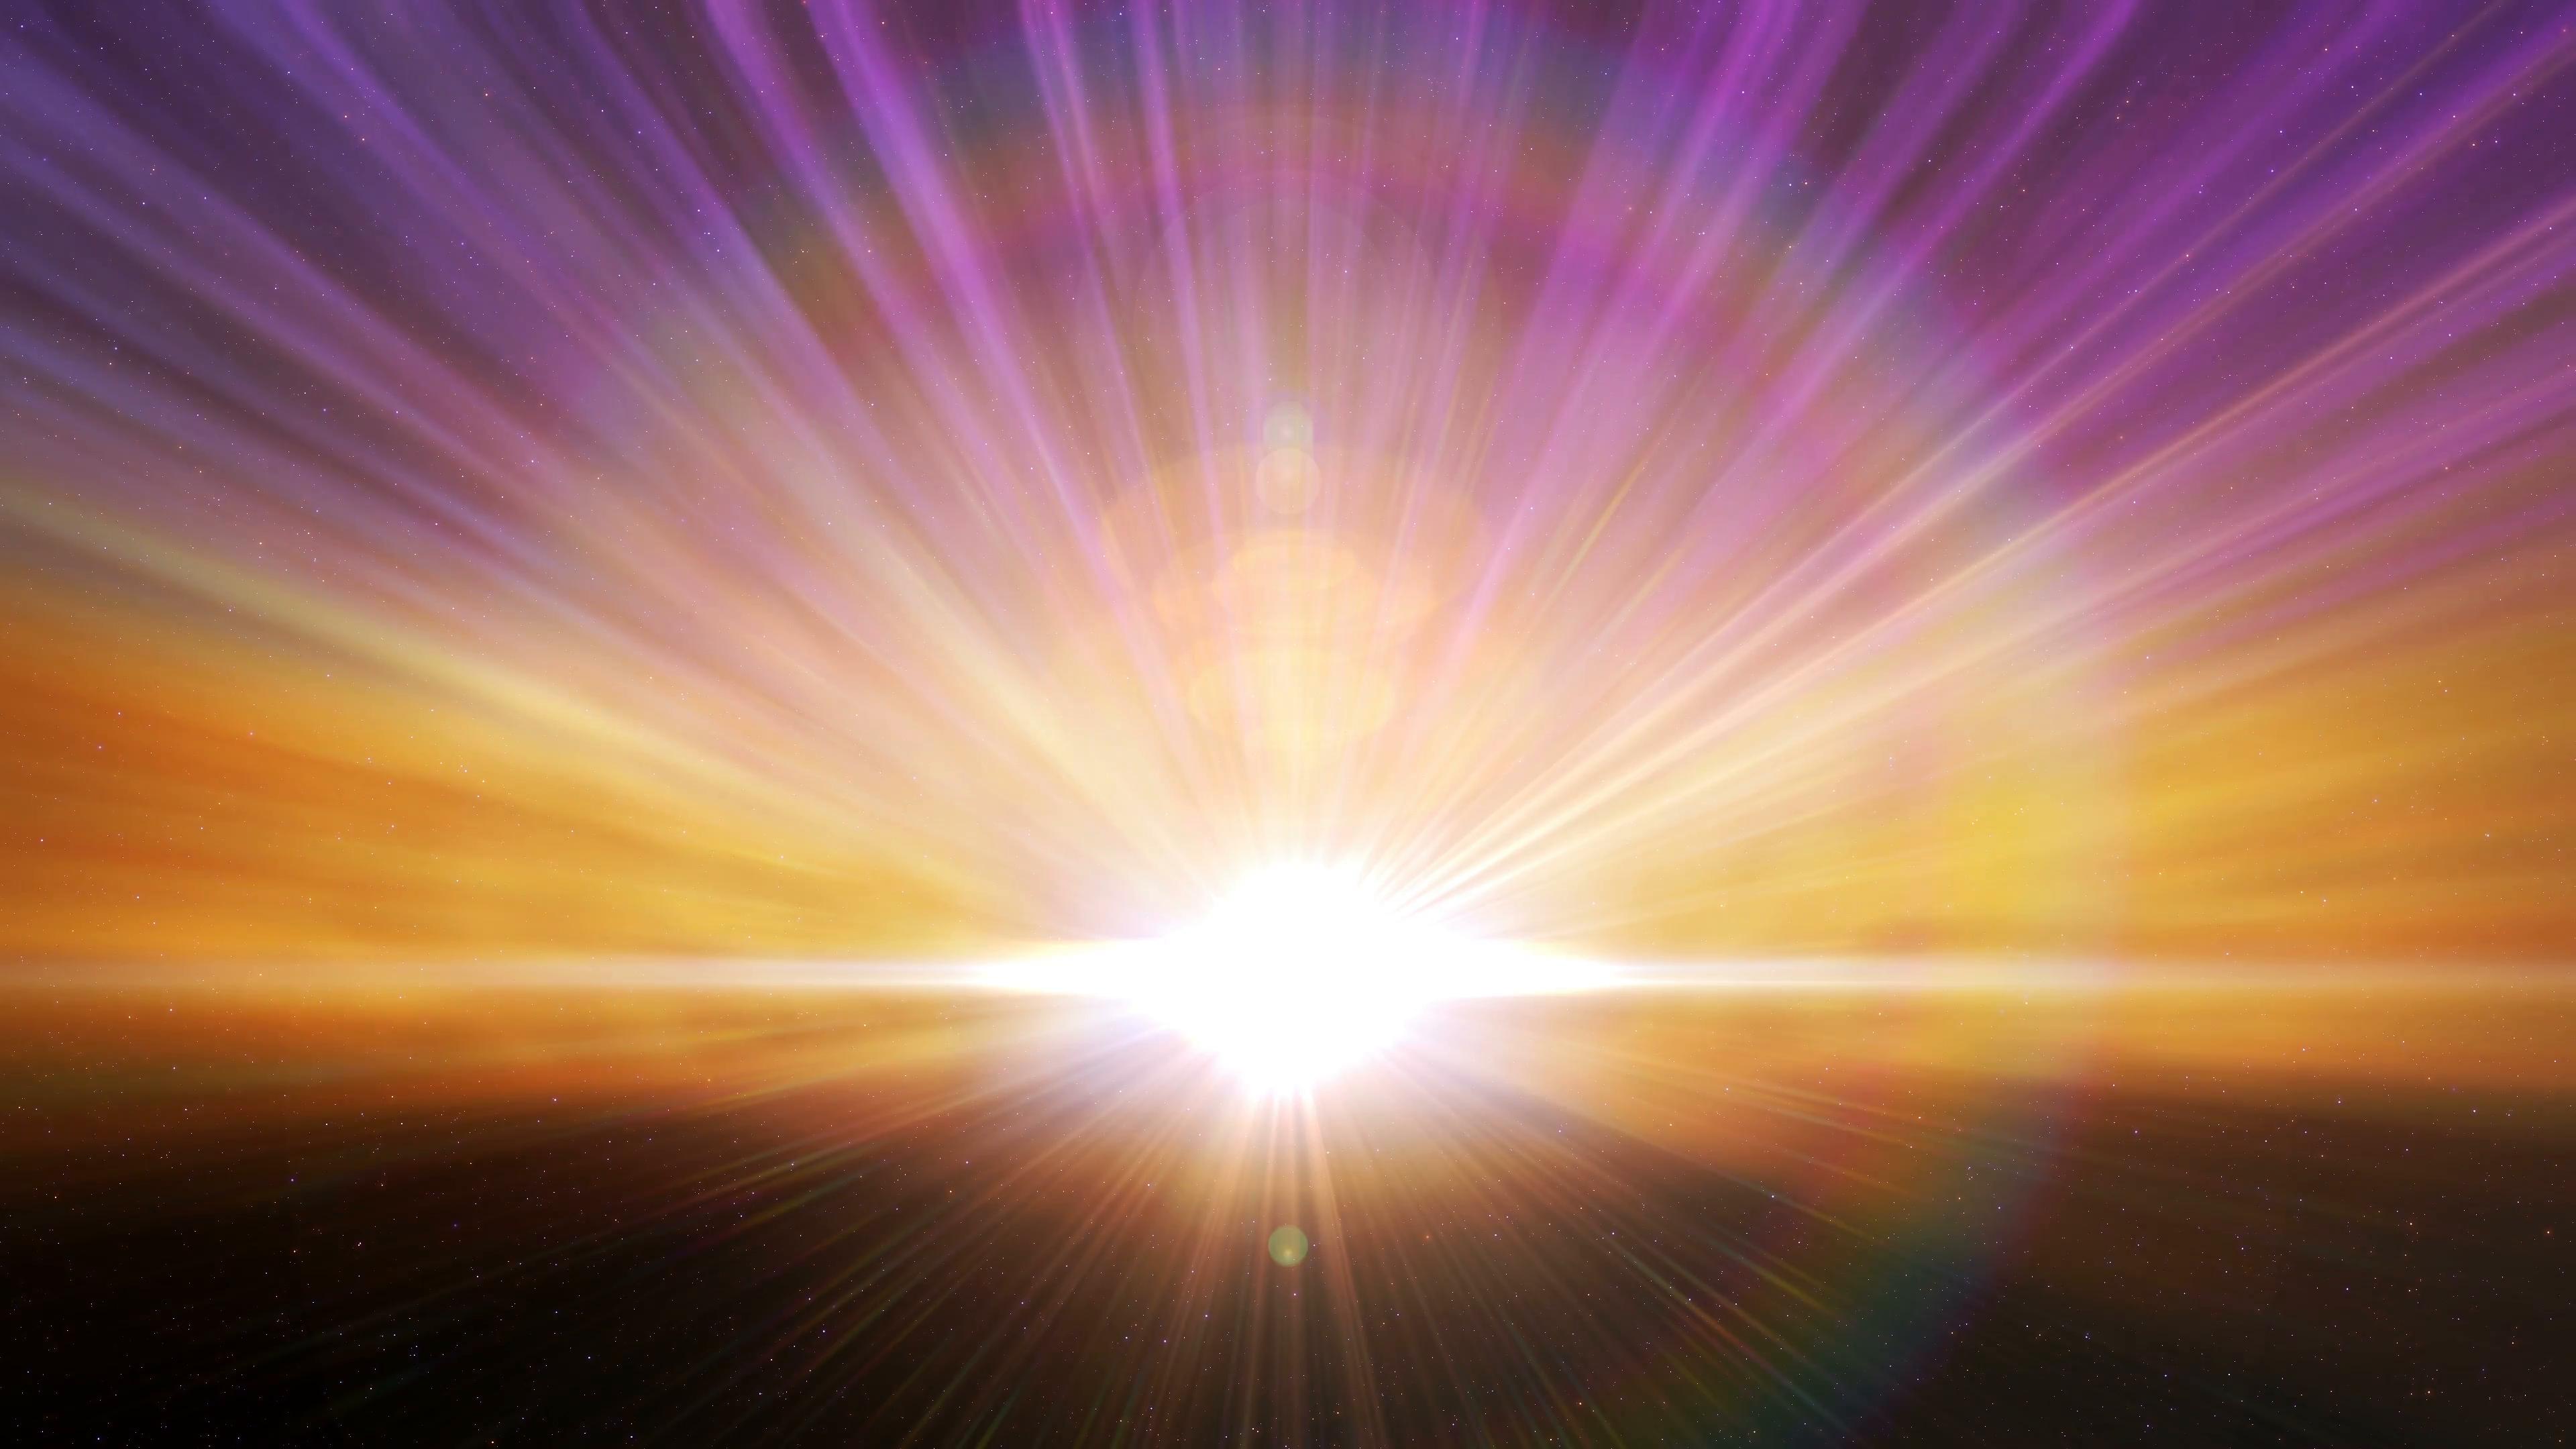 Cosmic Horizon Light Burst Loop Motion Background - Videoblocks